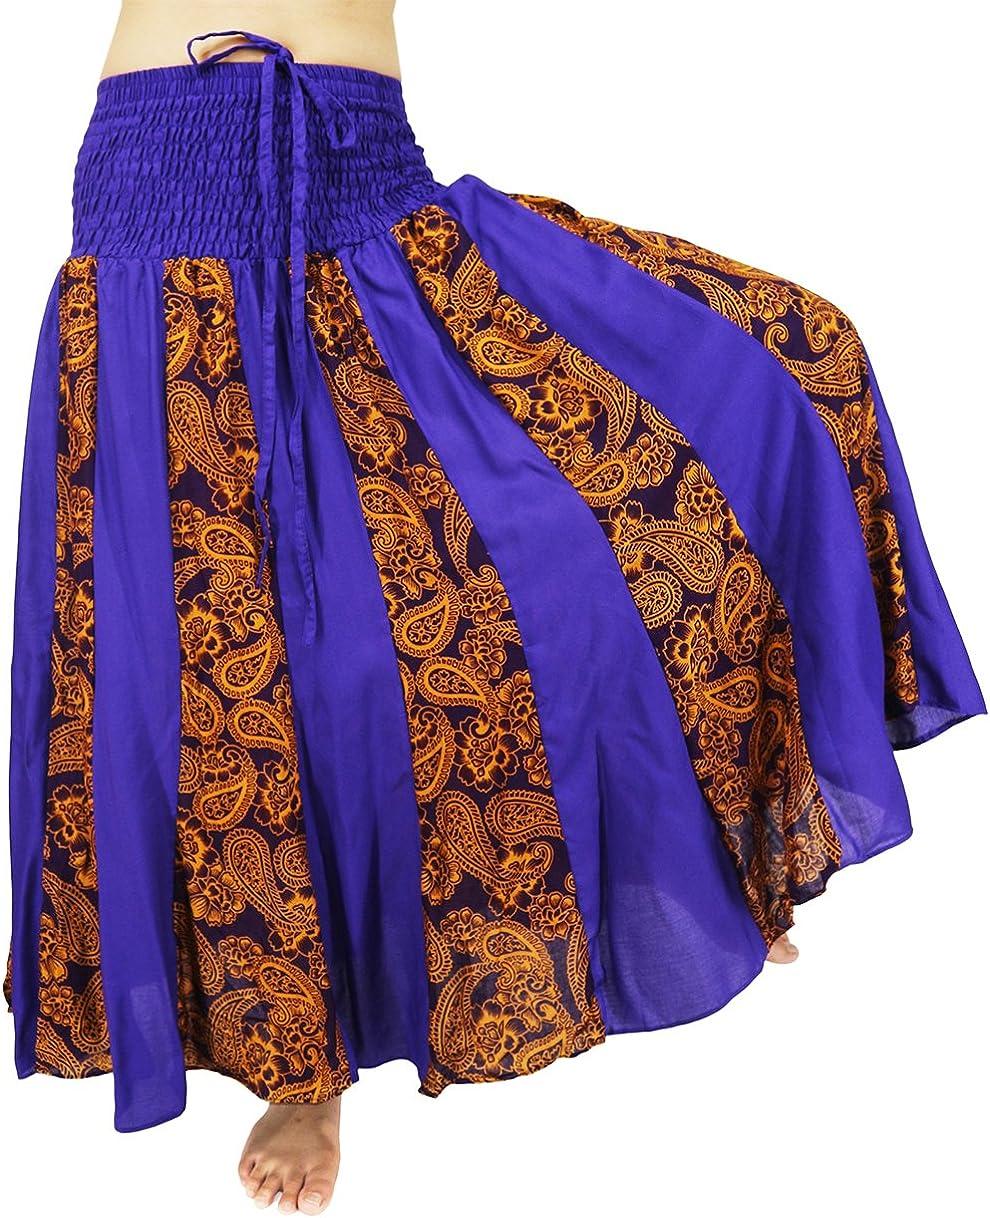 Lovely Creations Women's Maxi Skirt Smocked Waist 23-40 Inchs Jumpsuit